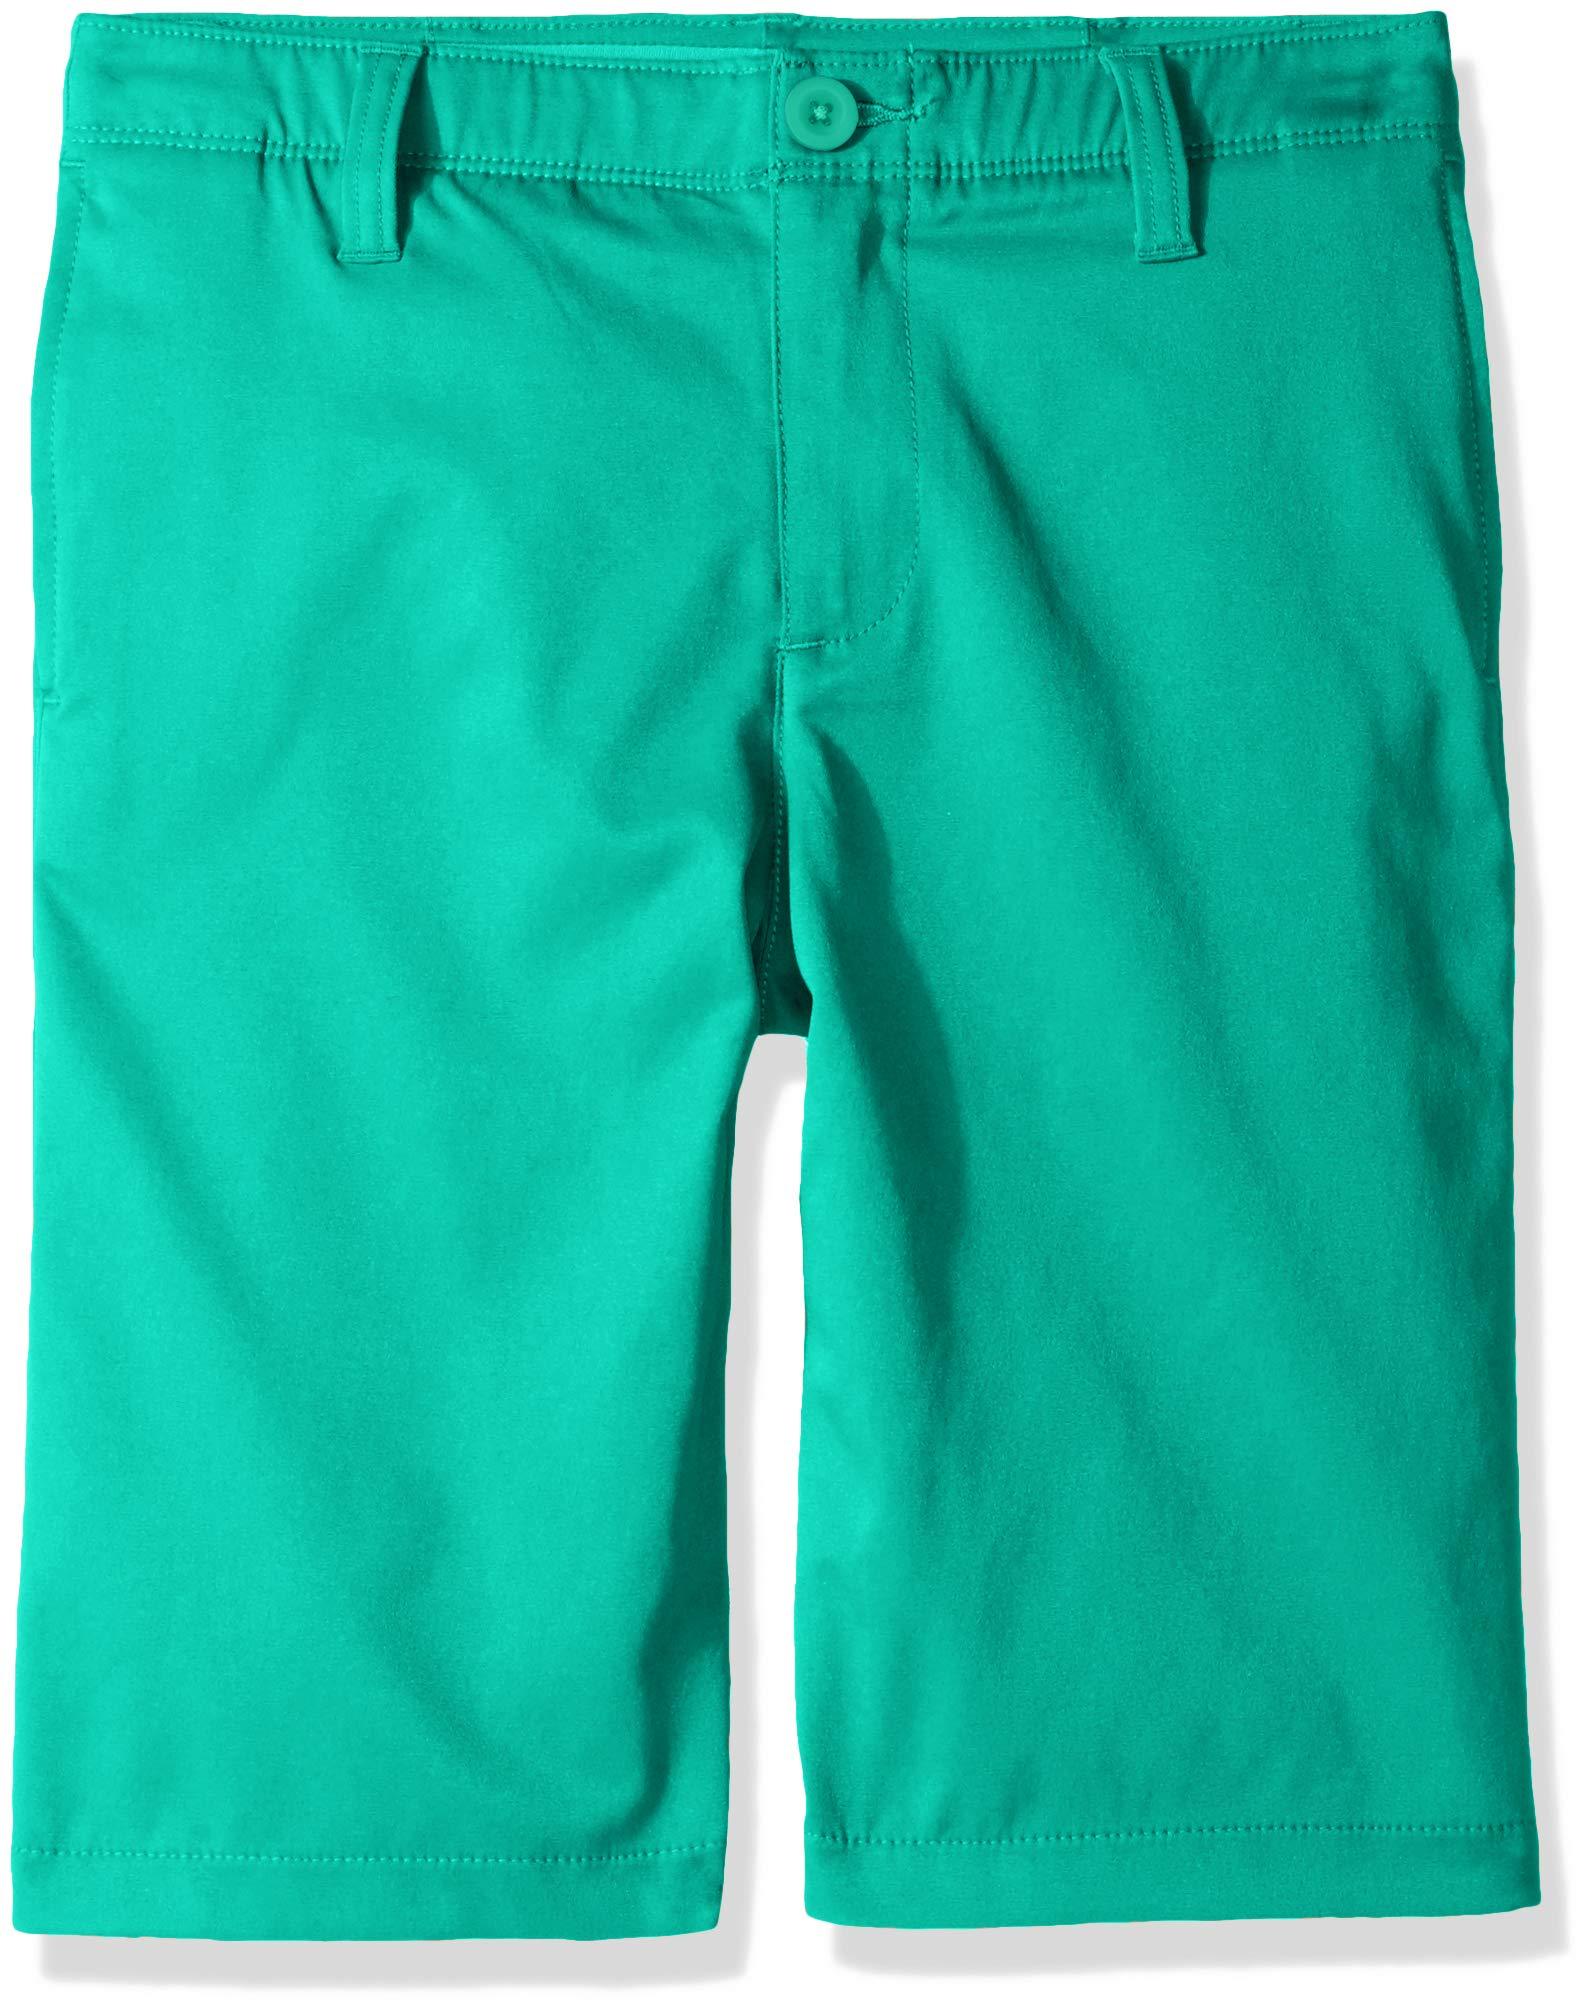 Under Armour Boys' Match Play Polo Shorts, Green Malachite (349)/Green Malachite,18 by Under Armour